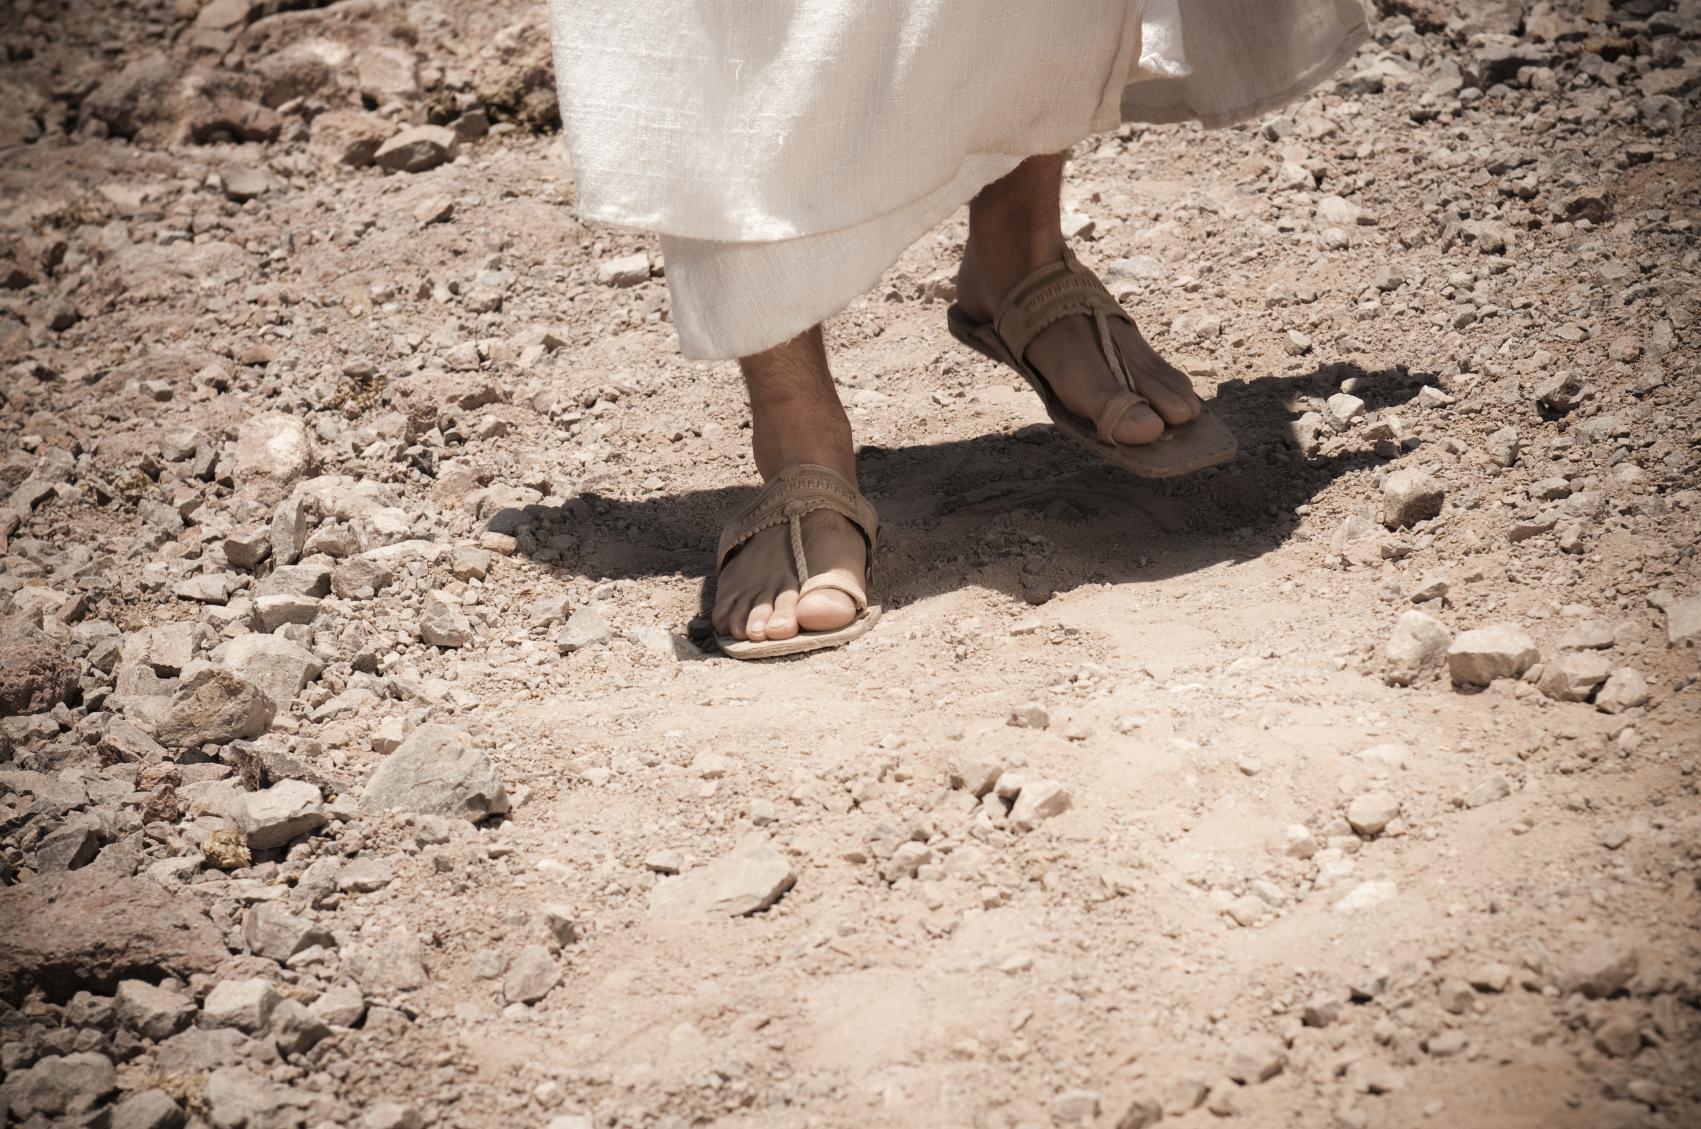 Os passos da misericórdia